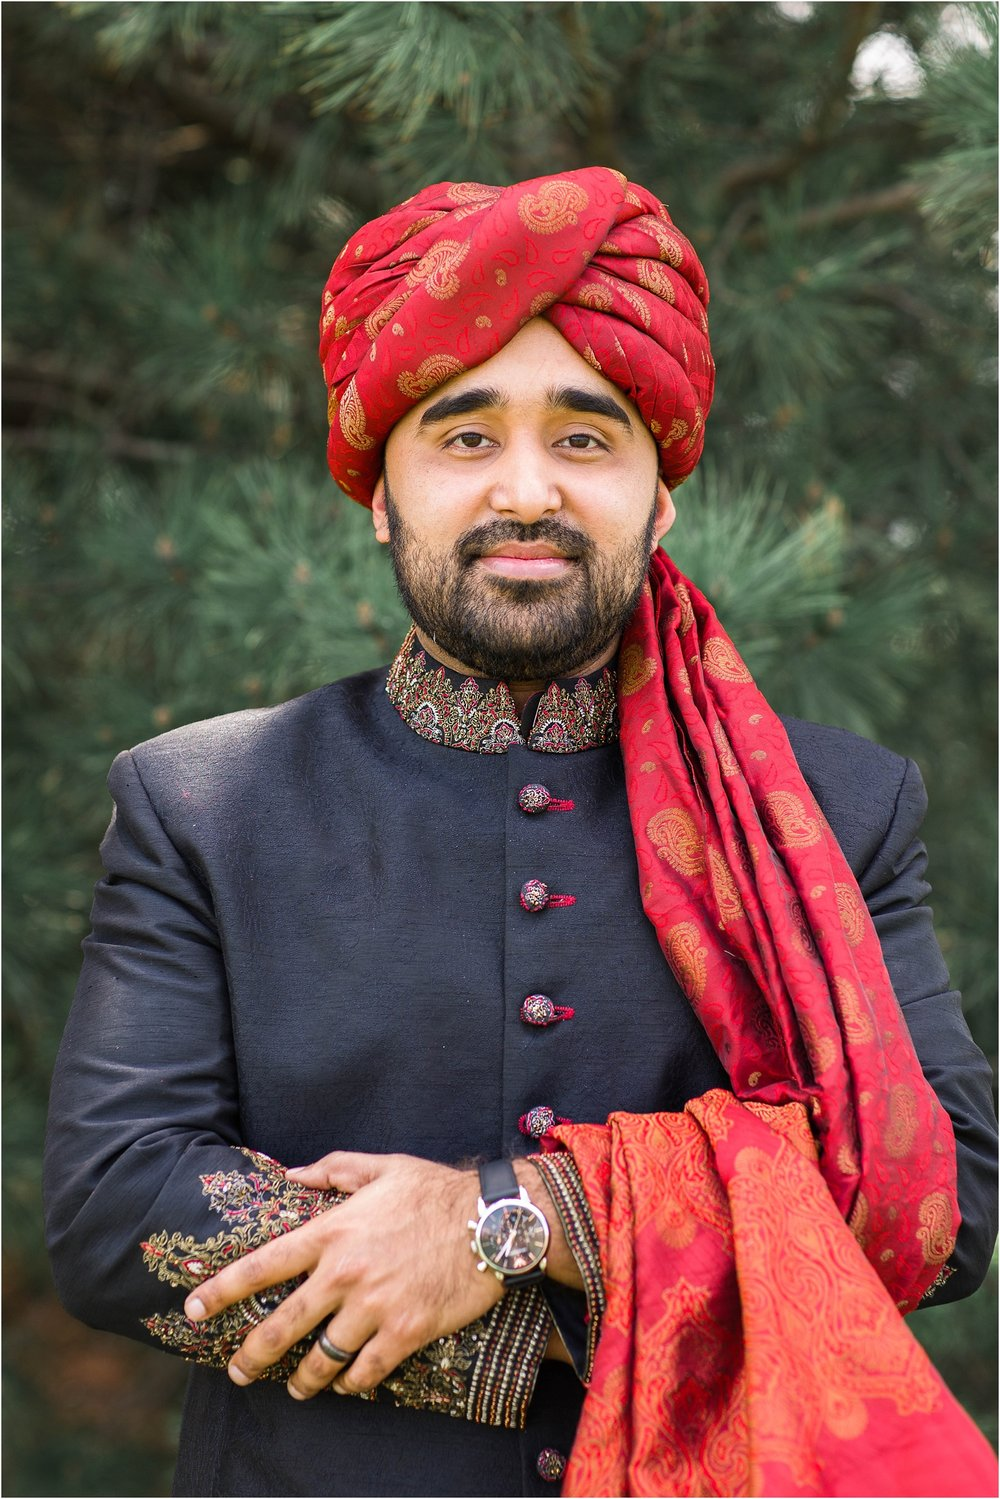 Jame-Masjid-Coopers-Mosque-Kariya-Park-Cherry-Blossoms-Wedding-Toronto-Mississauga-Brampton-Scarborough-GTA-Pakistani-Indian-Wedding-Engagement-Photographer-Photography_0024.jpg